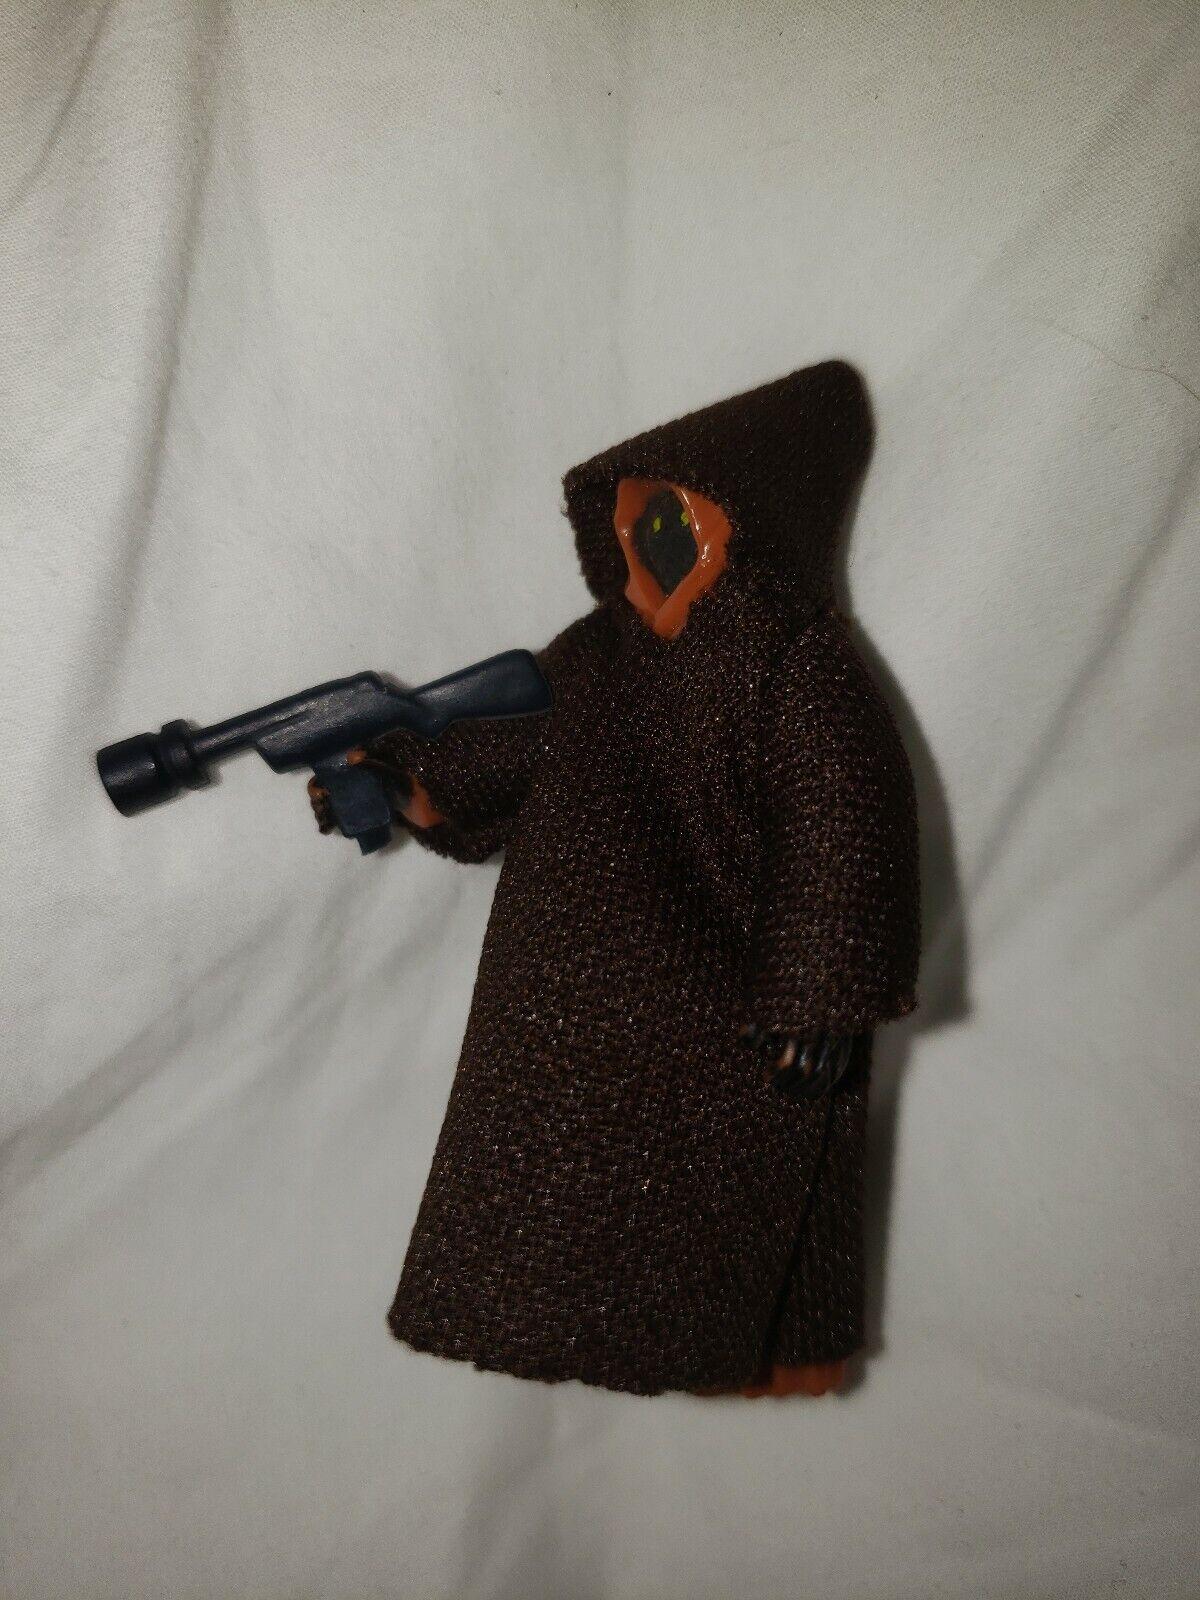 Star Wars Jawa 1977 Blaster Gun v1 Original figure accessory